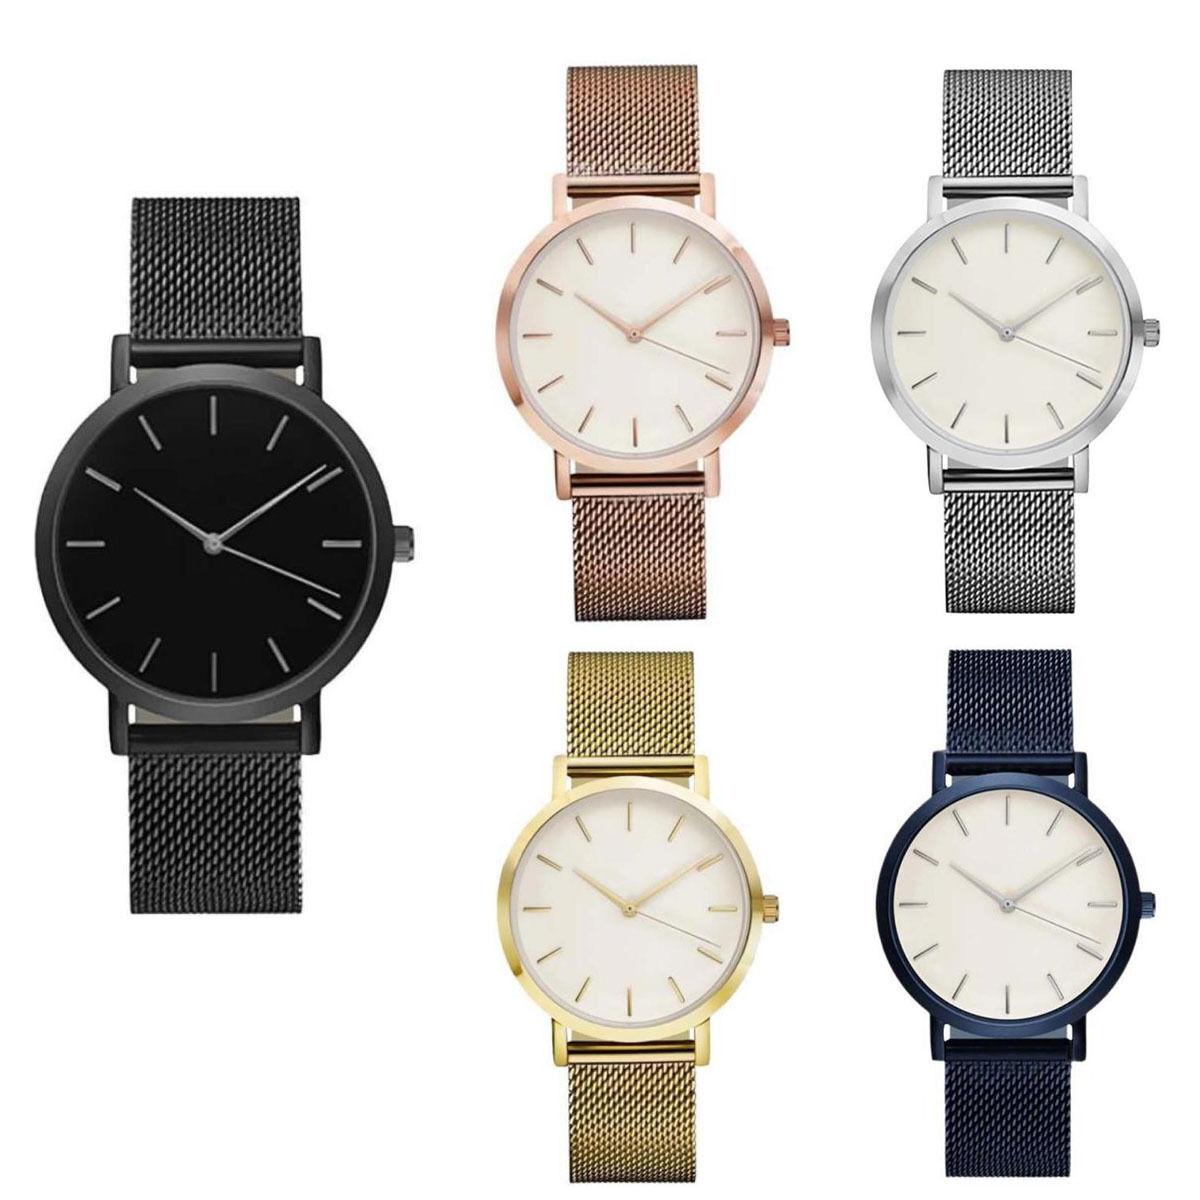 Classic Women's Men's Wrist Watch Steel Strap Quartz Casual Watches Wrist Watch